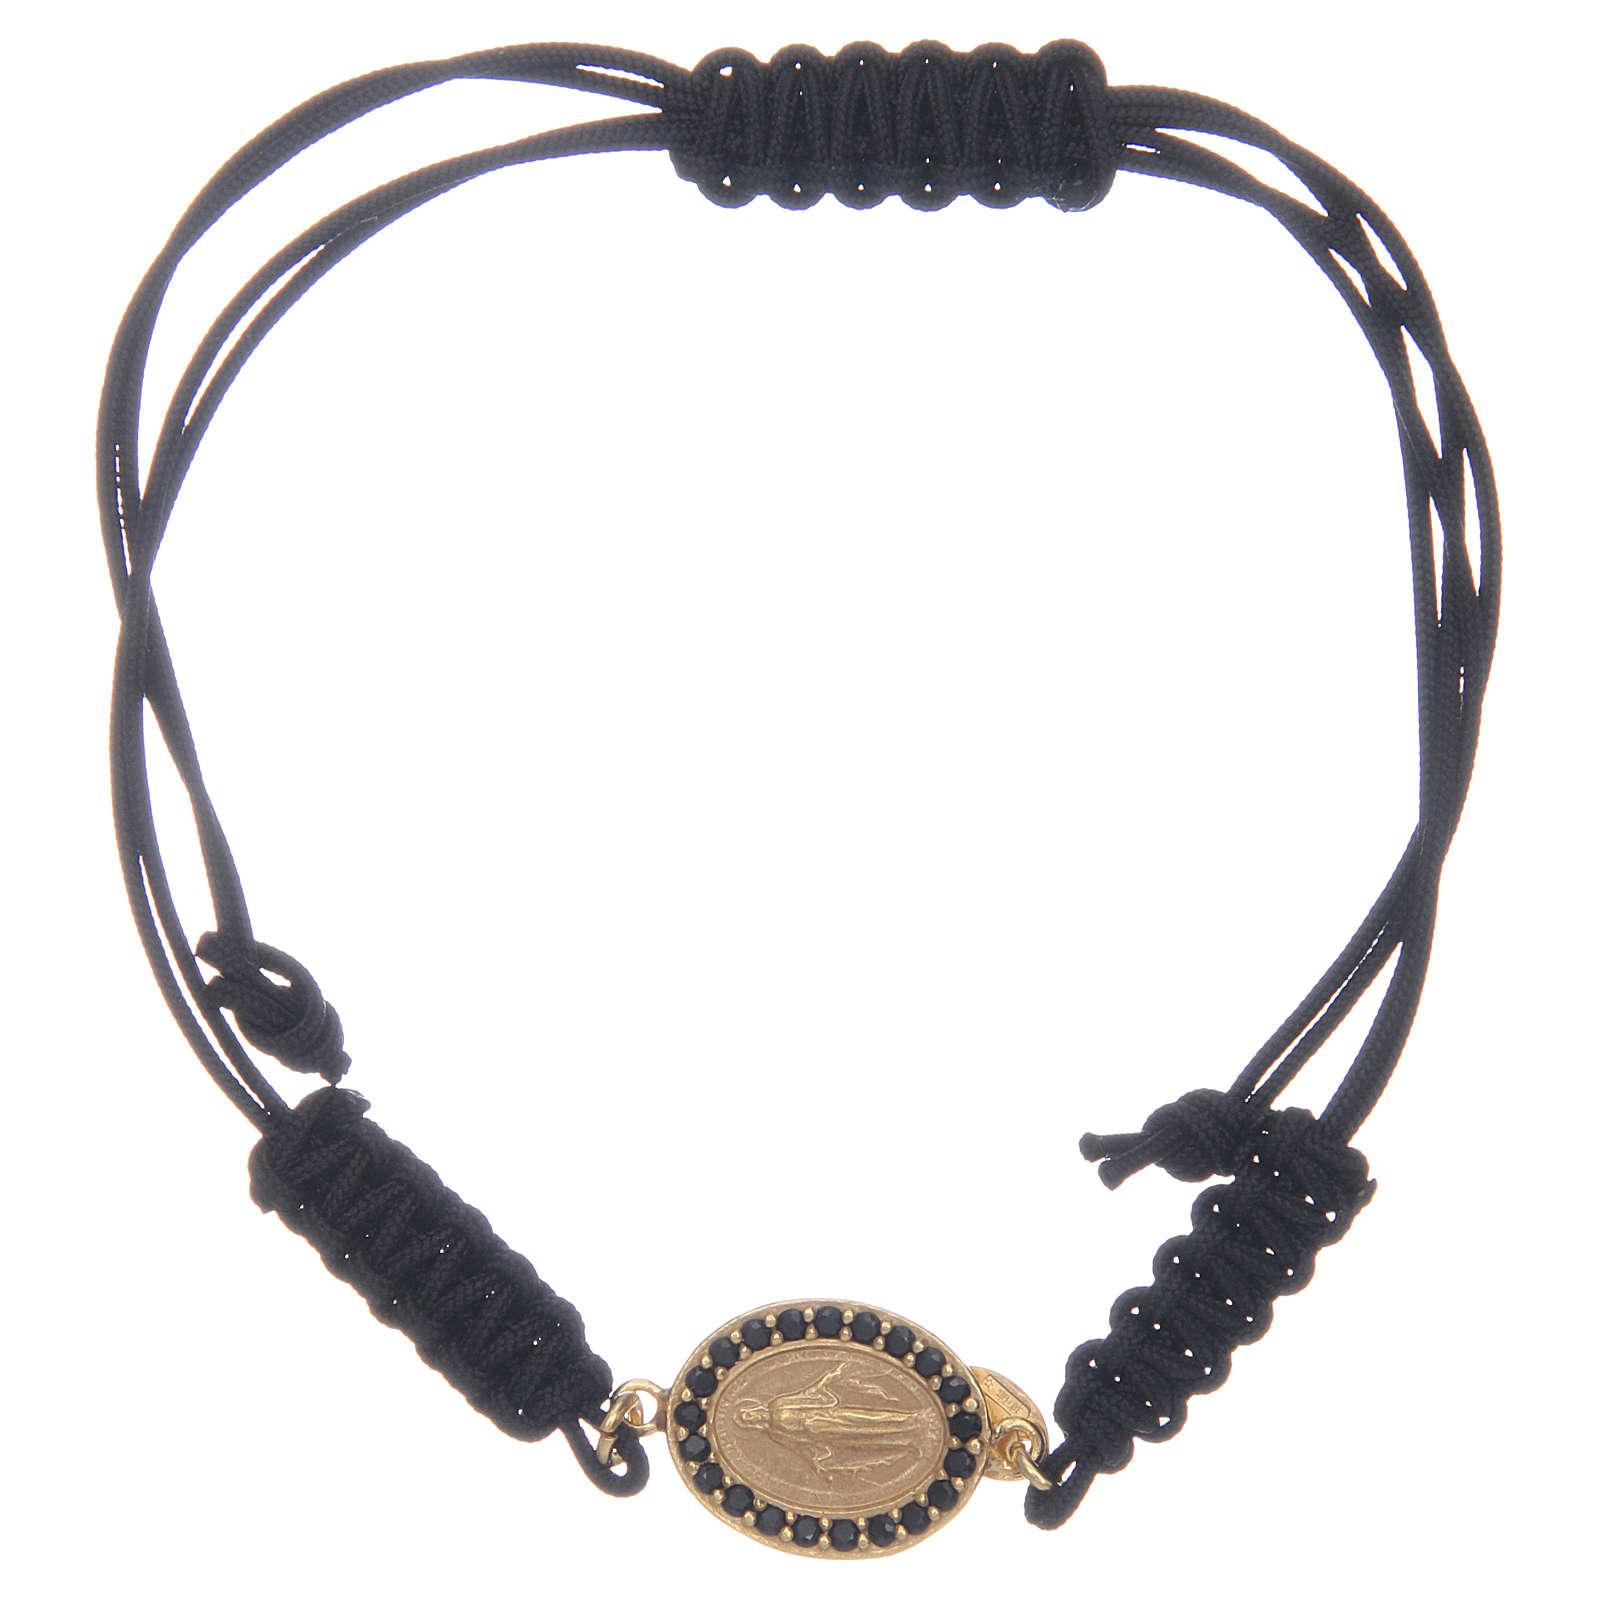 Pulsera cuerda plata 925 Milagrosa dorada zircones negros 4